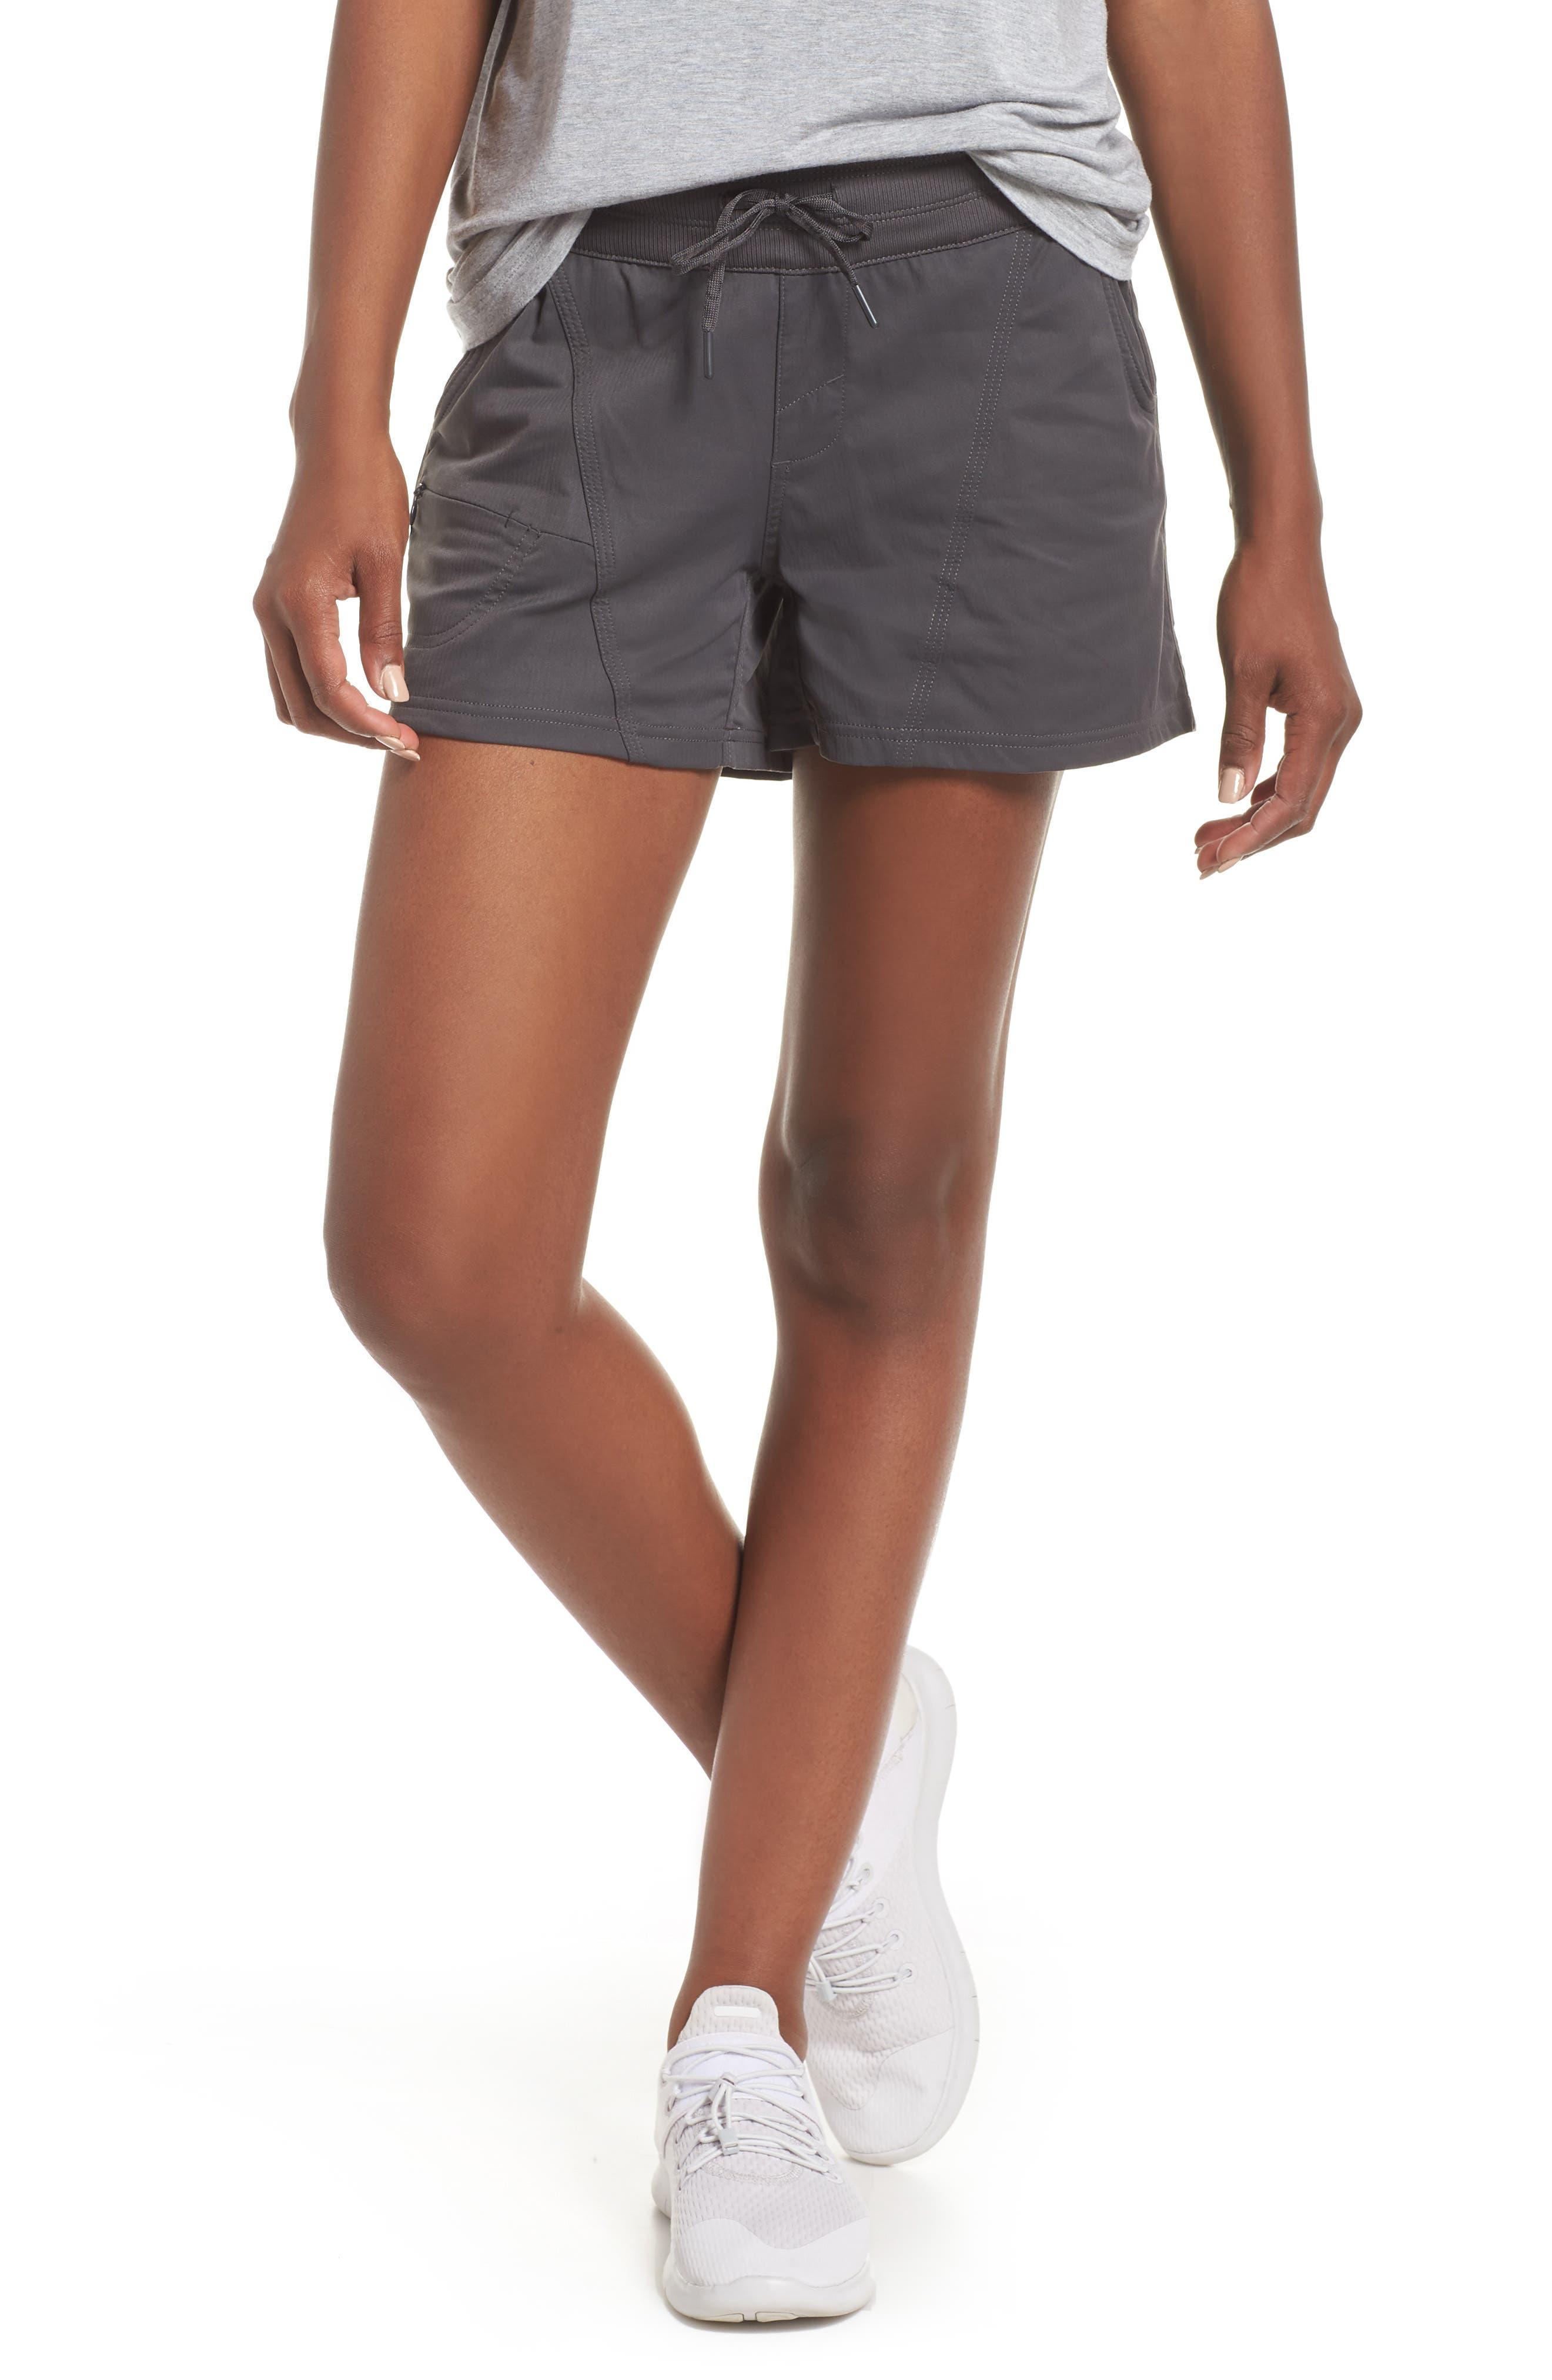 Aphrodite 2.0 Hiking Shorts,                         Main,                         color, 021